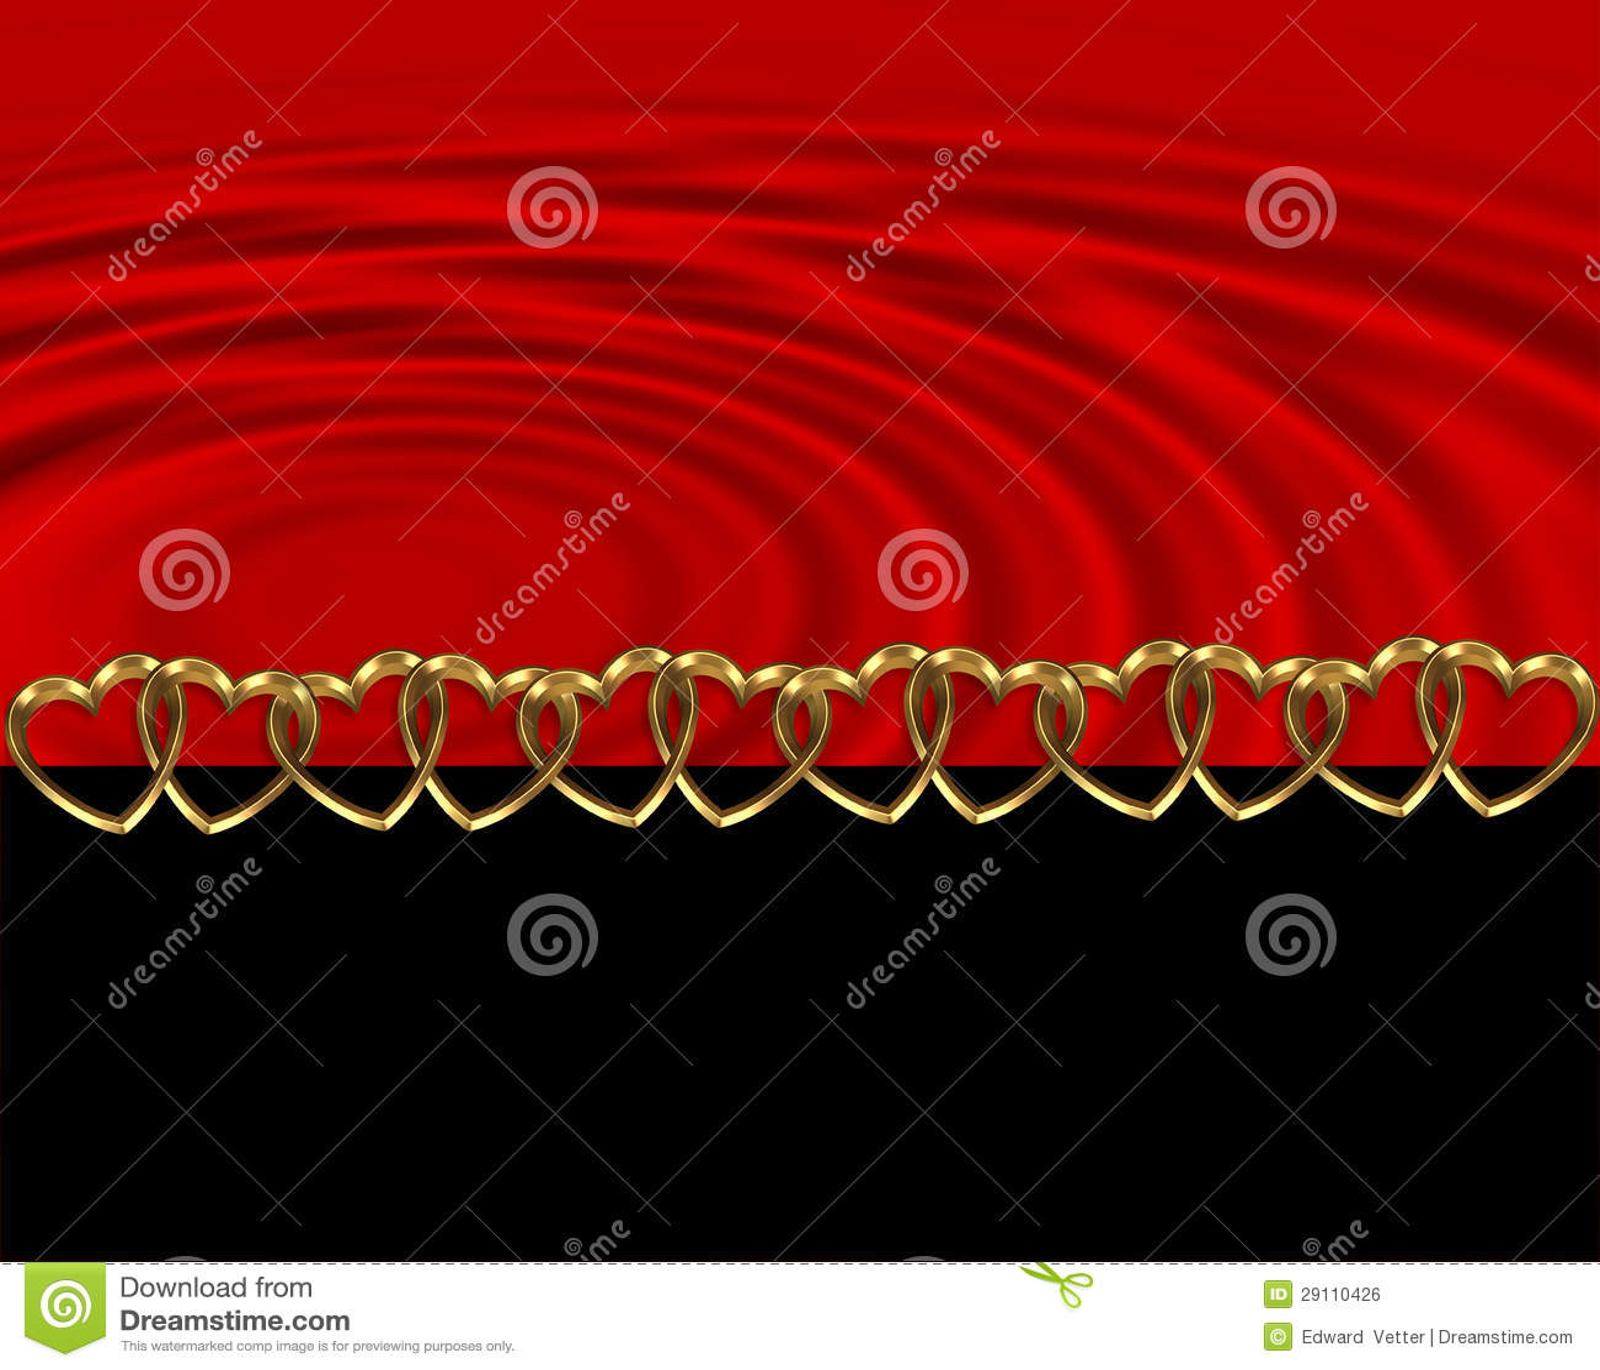 Wedding Invitation Red And Black Stock Illustration Illustration